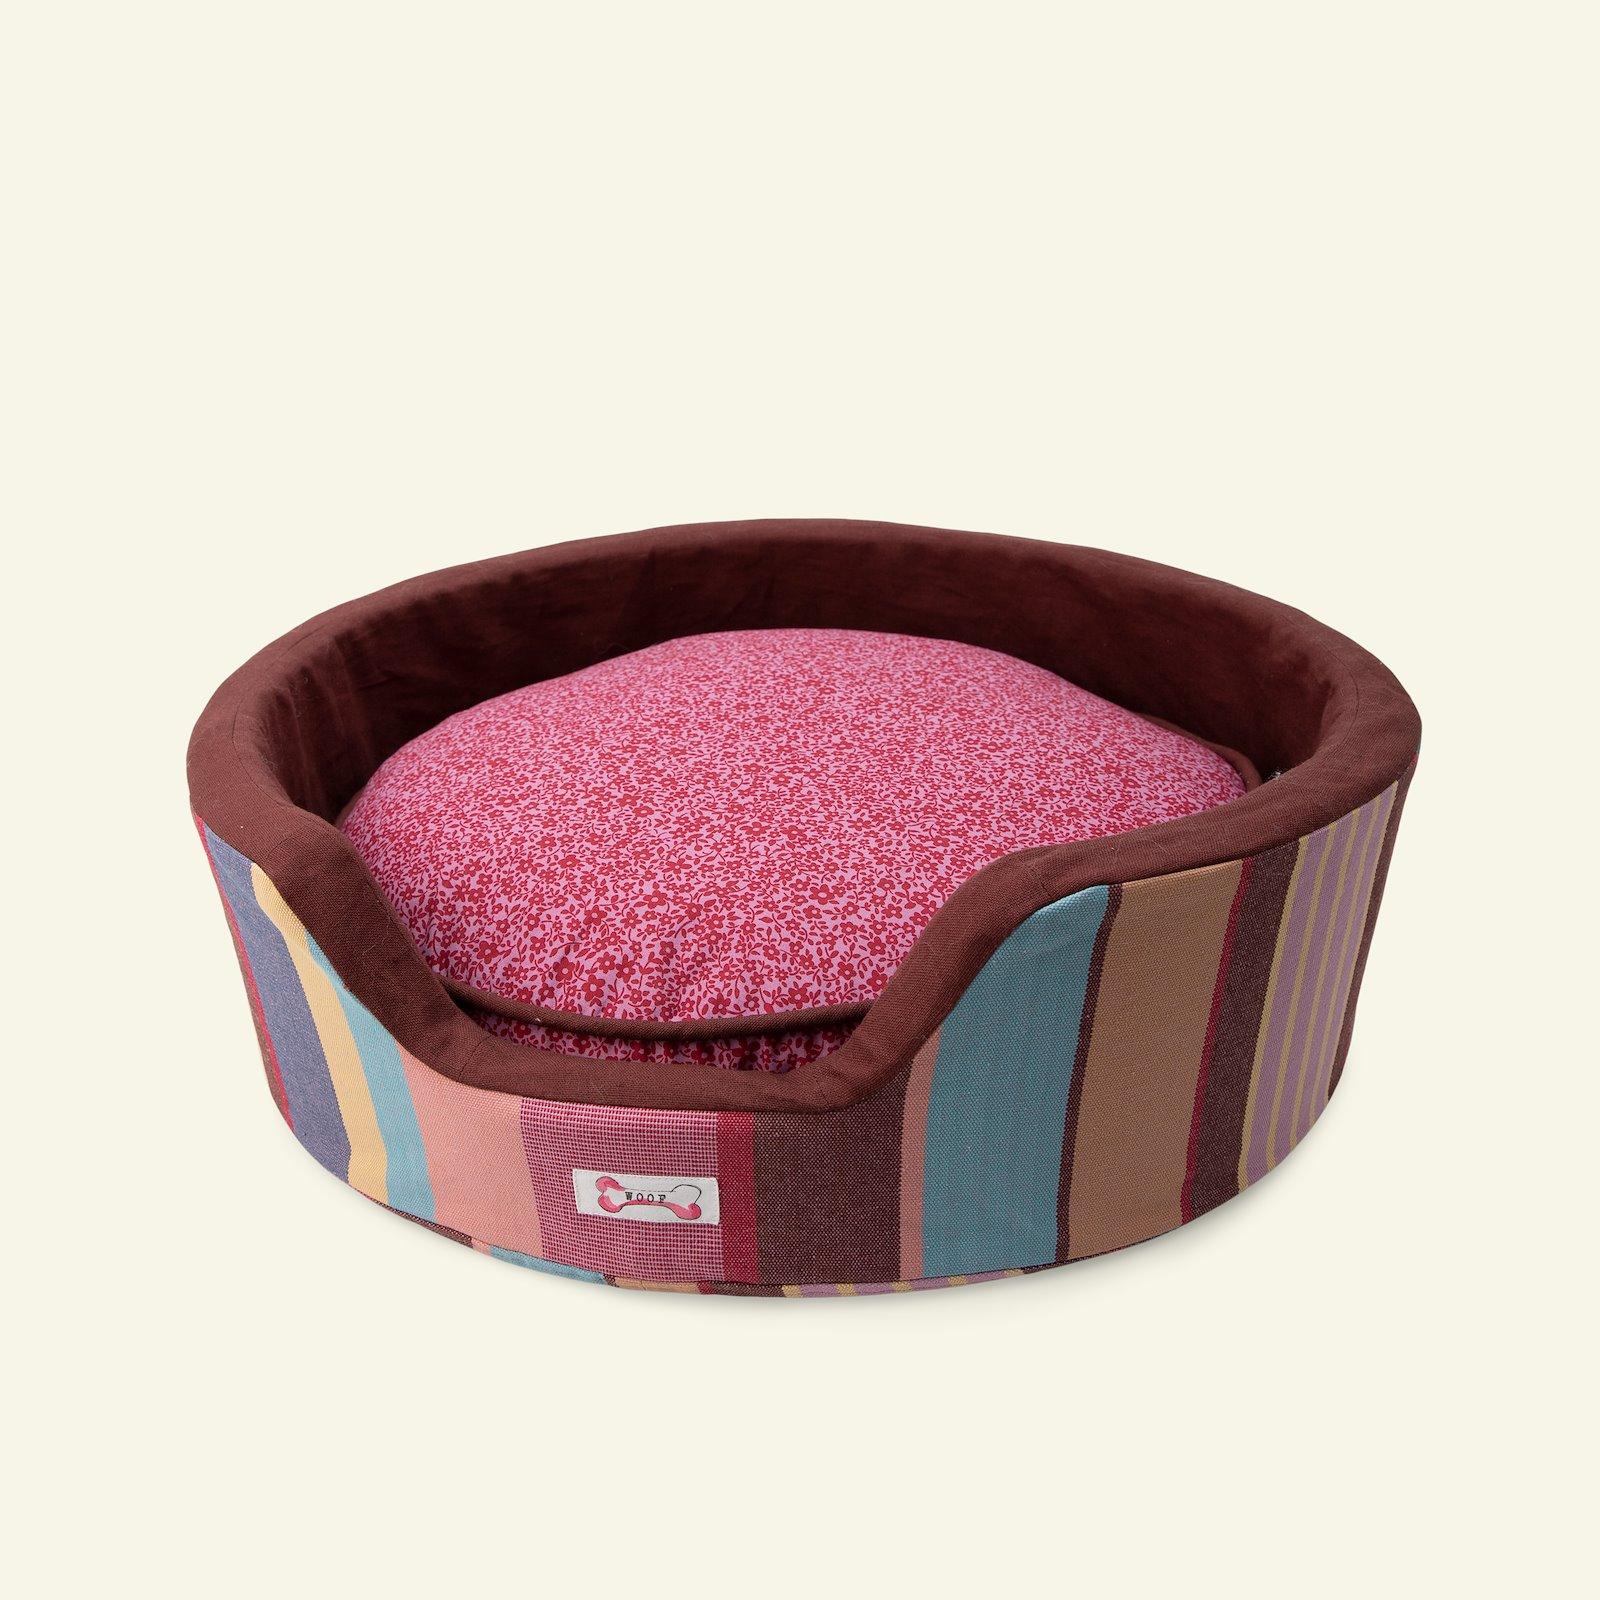 Dog coat p90348_780550_410144_852413_24848_p90346_852414_780540_910_22309_22313_30333_45203_bundle